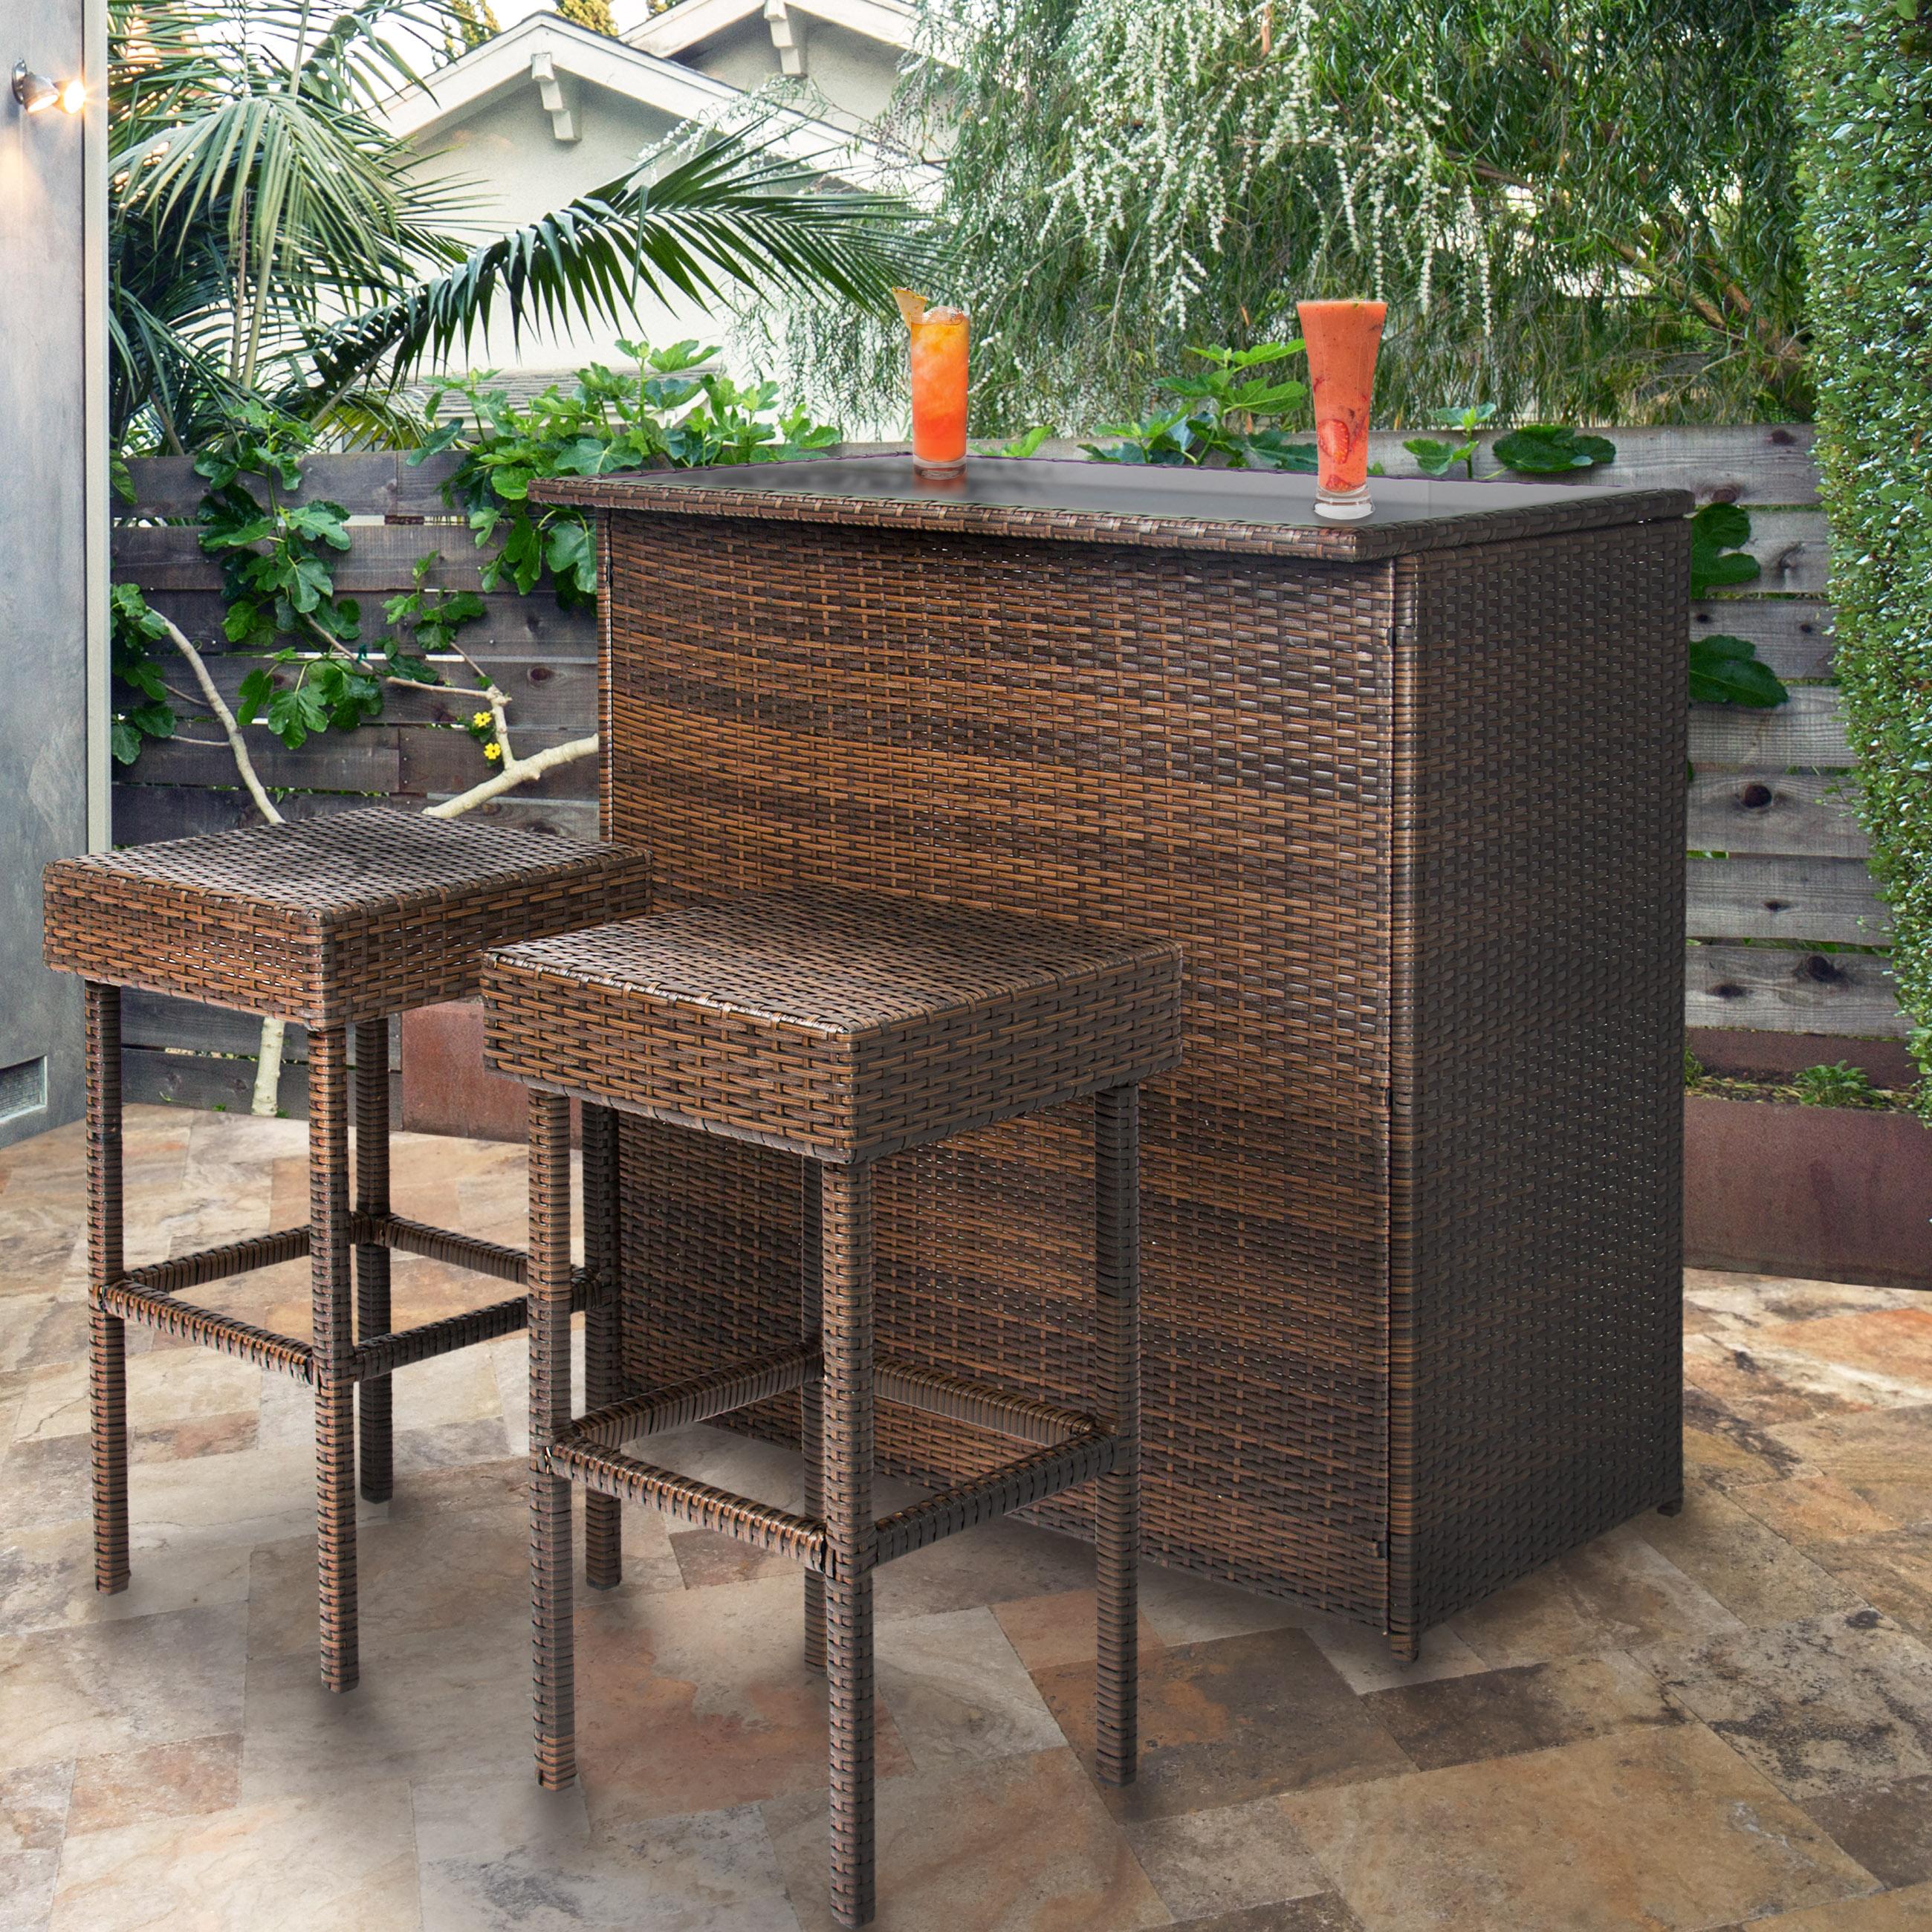 Outdoor Bar Furniture Best Choice Products 3 Piece Basket Bar Set Patio Outdoor Backyard Table & PPRFHIB